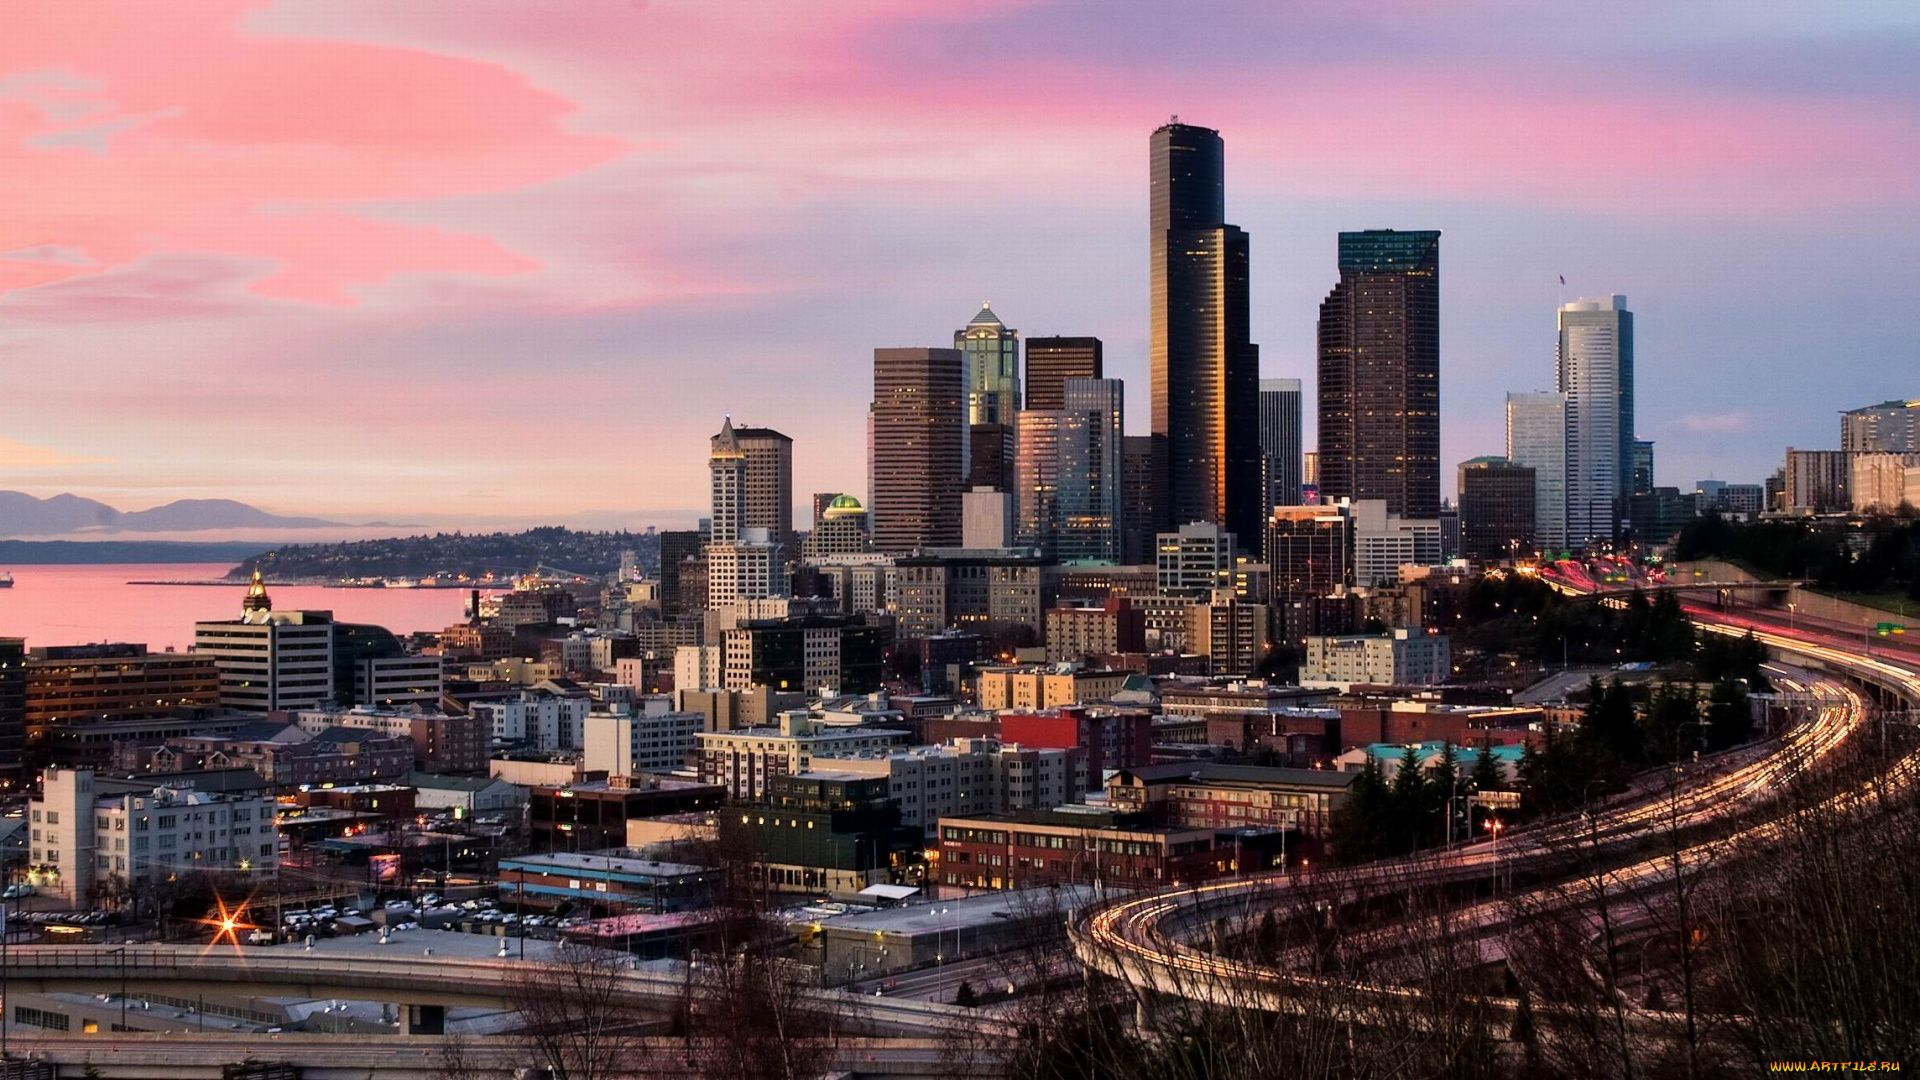 Seattle wallpaper background